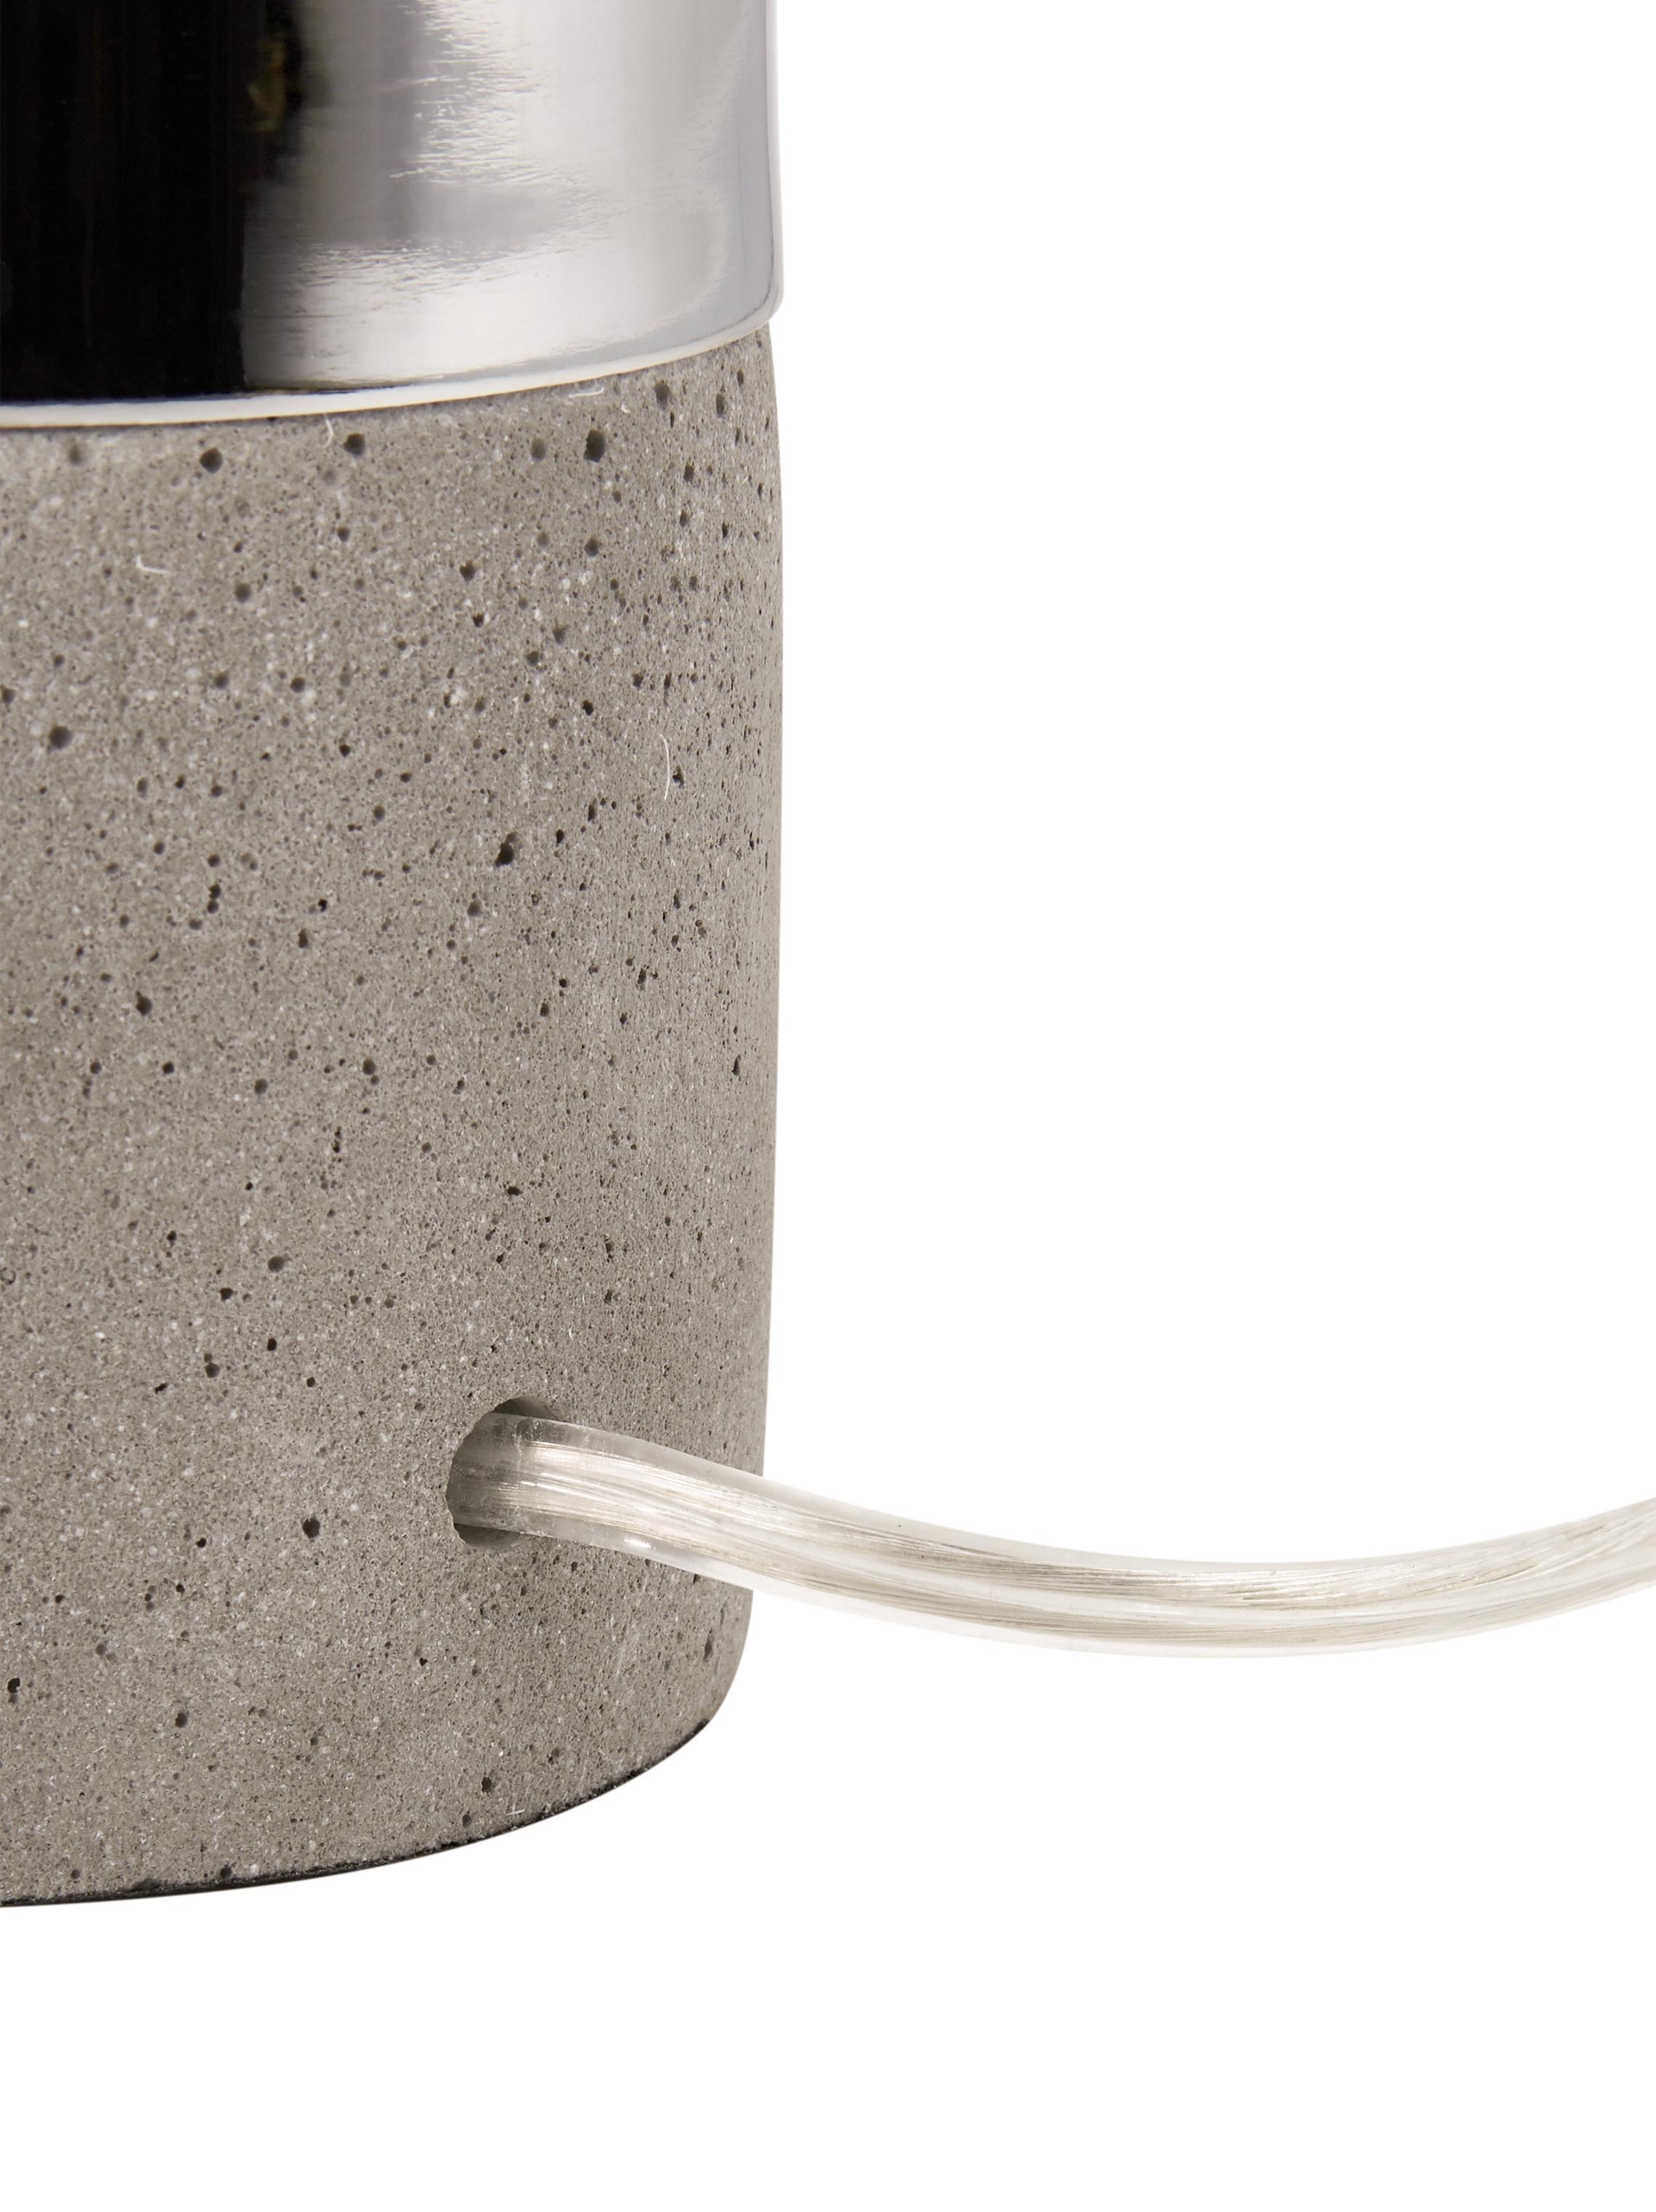 Beton-Tischlampe Athen, Grau, Chrom, Ø 8 x H 14 cm